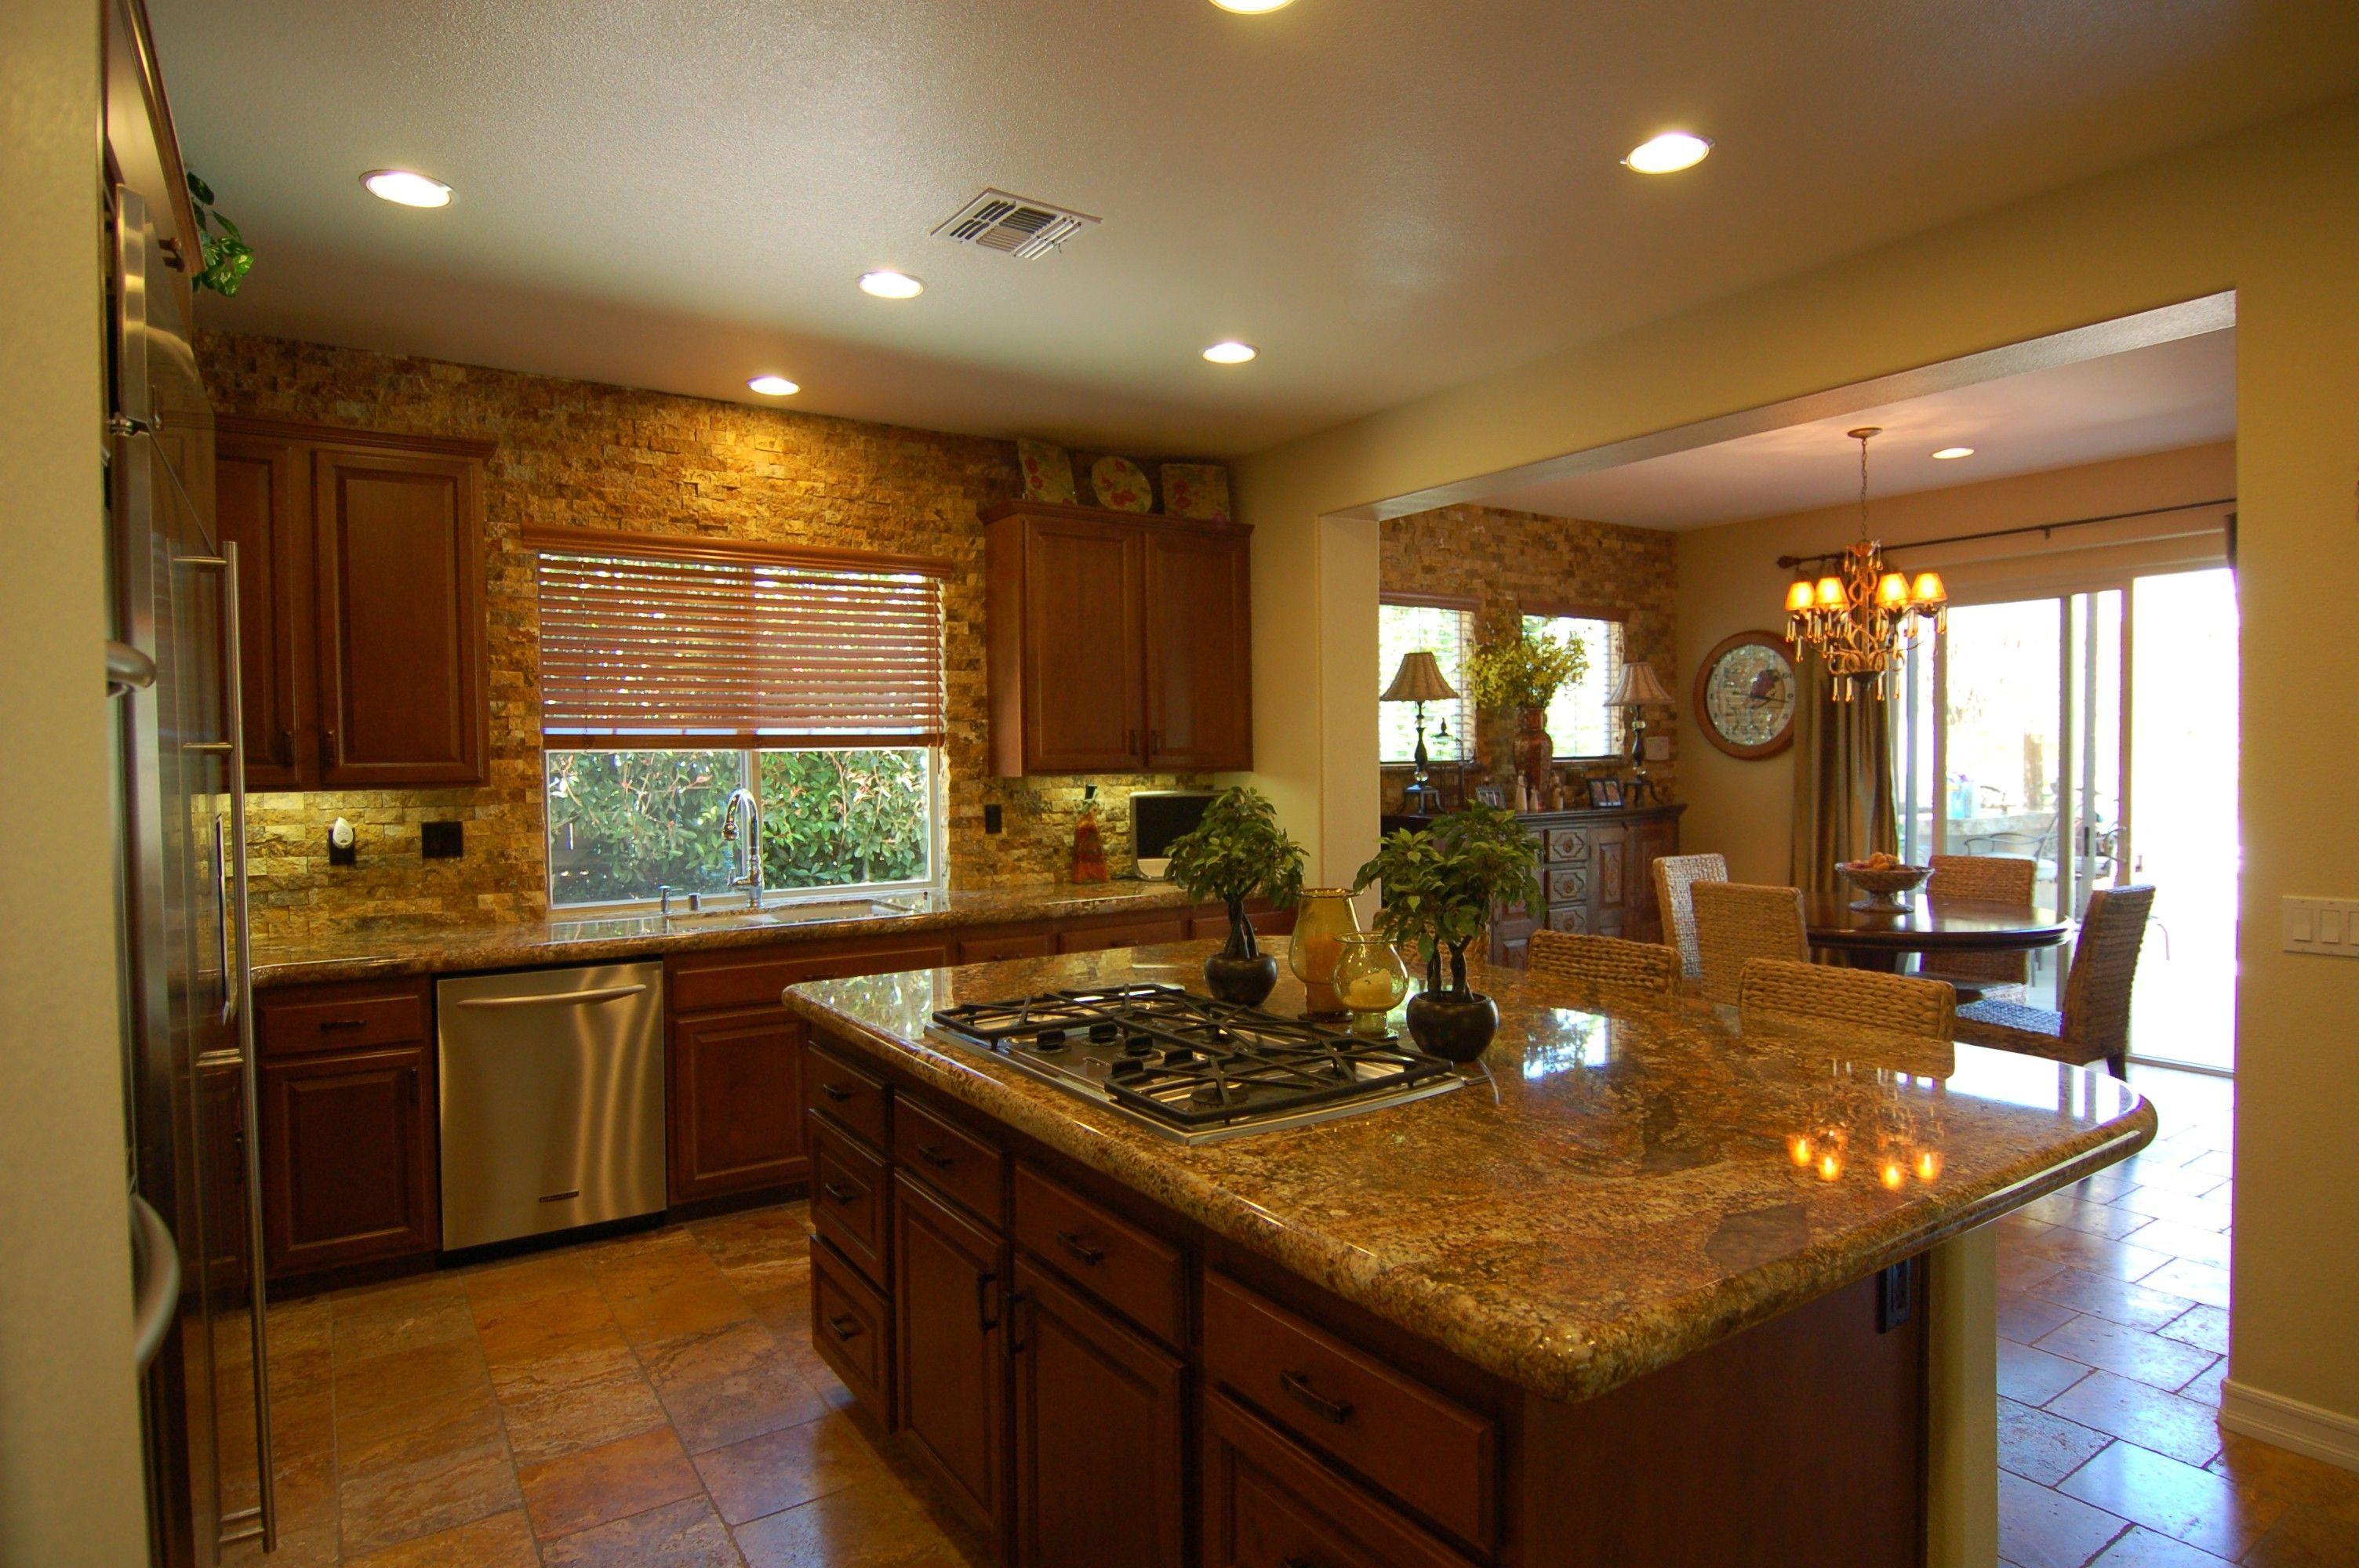 Køkkenskabe Bordplade Farvekombinationer